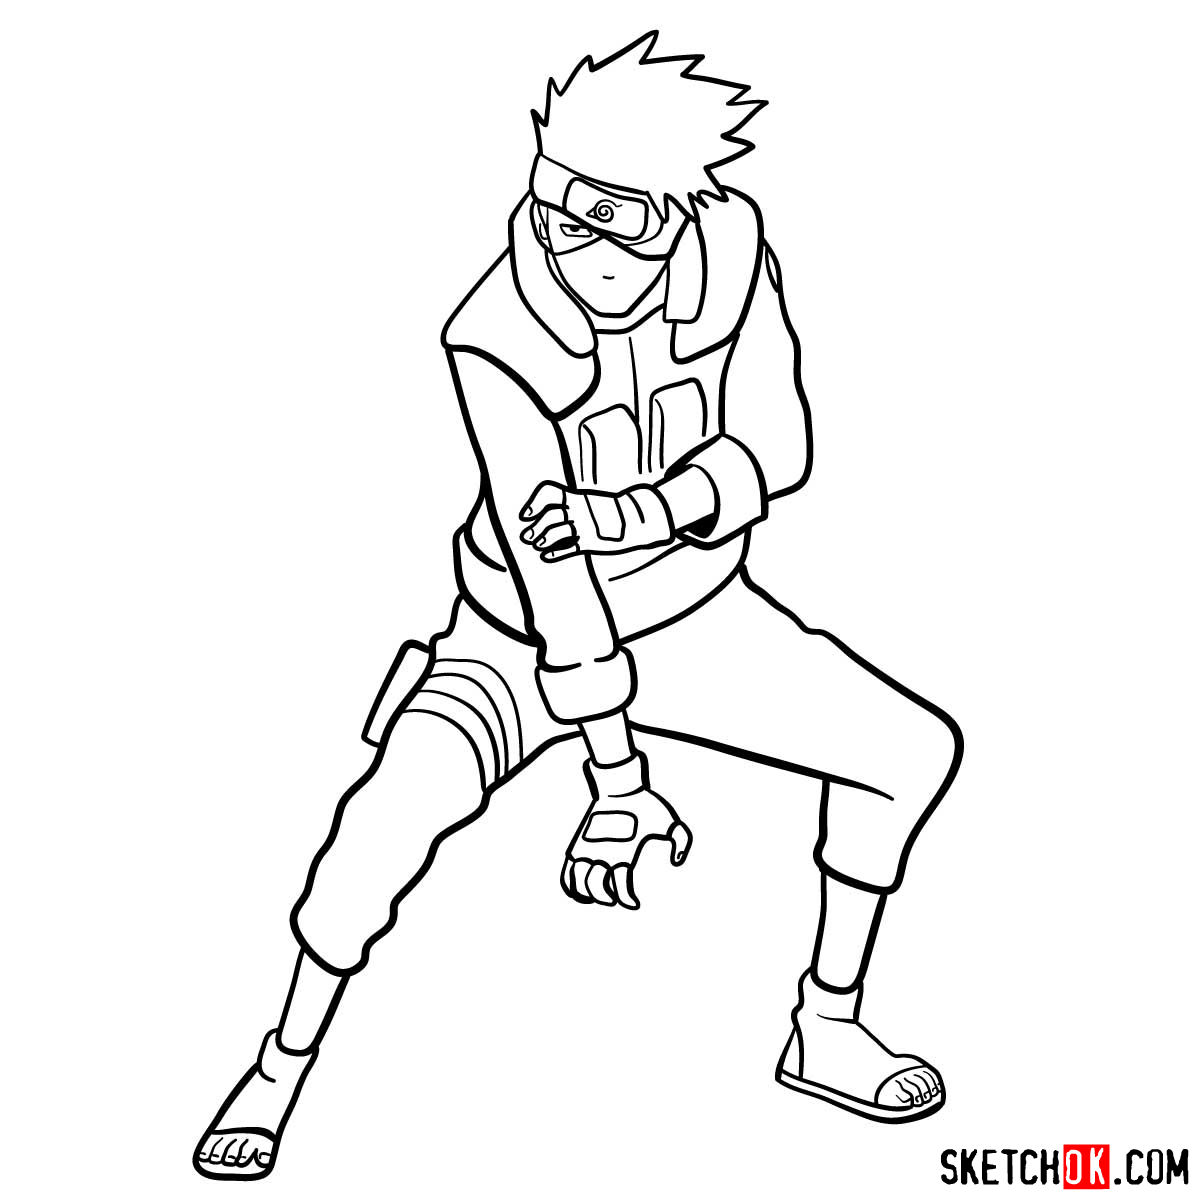 How to draw Kakashi Hatake from Naruto anime - step 14